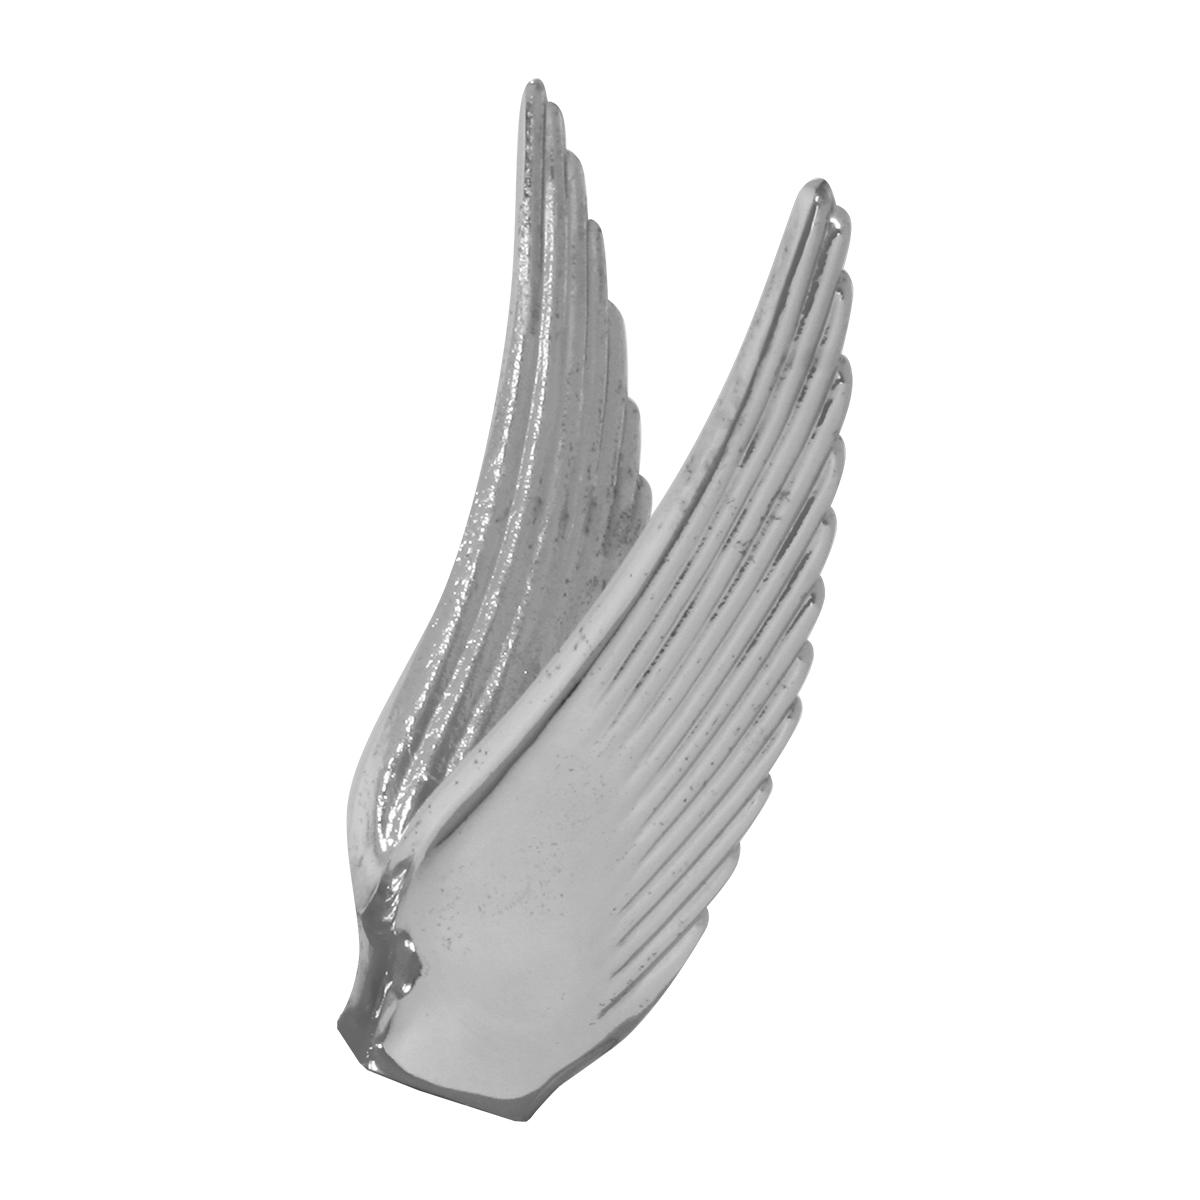 Chrome Die Cast Flying Goddess Hood Ornament - Wings Only